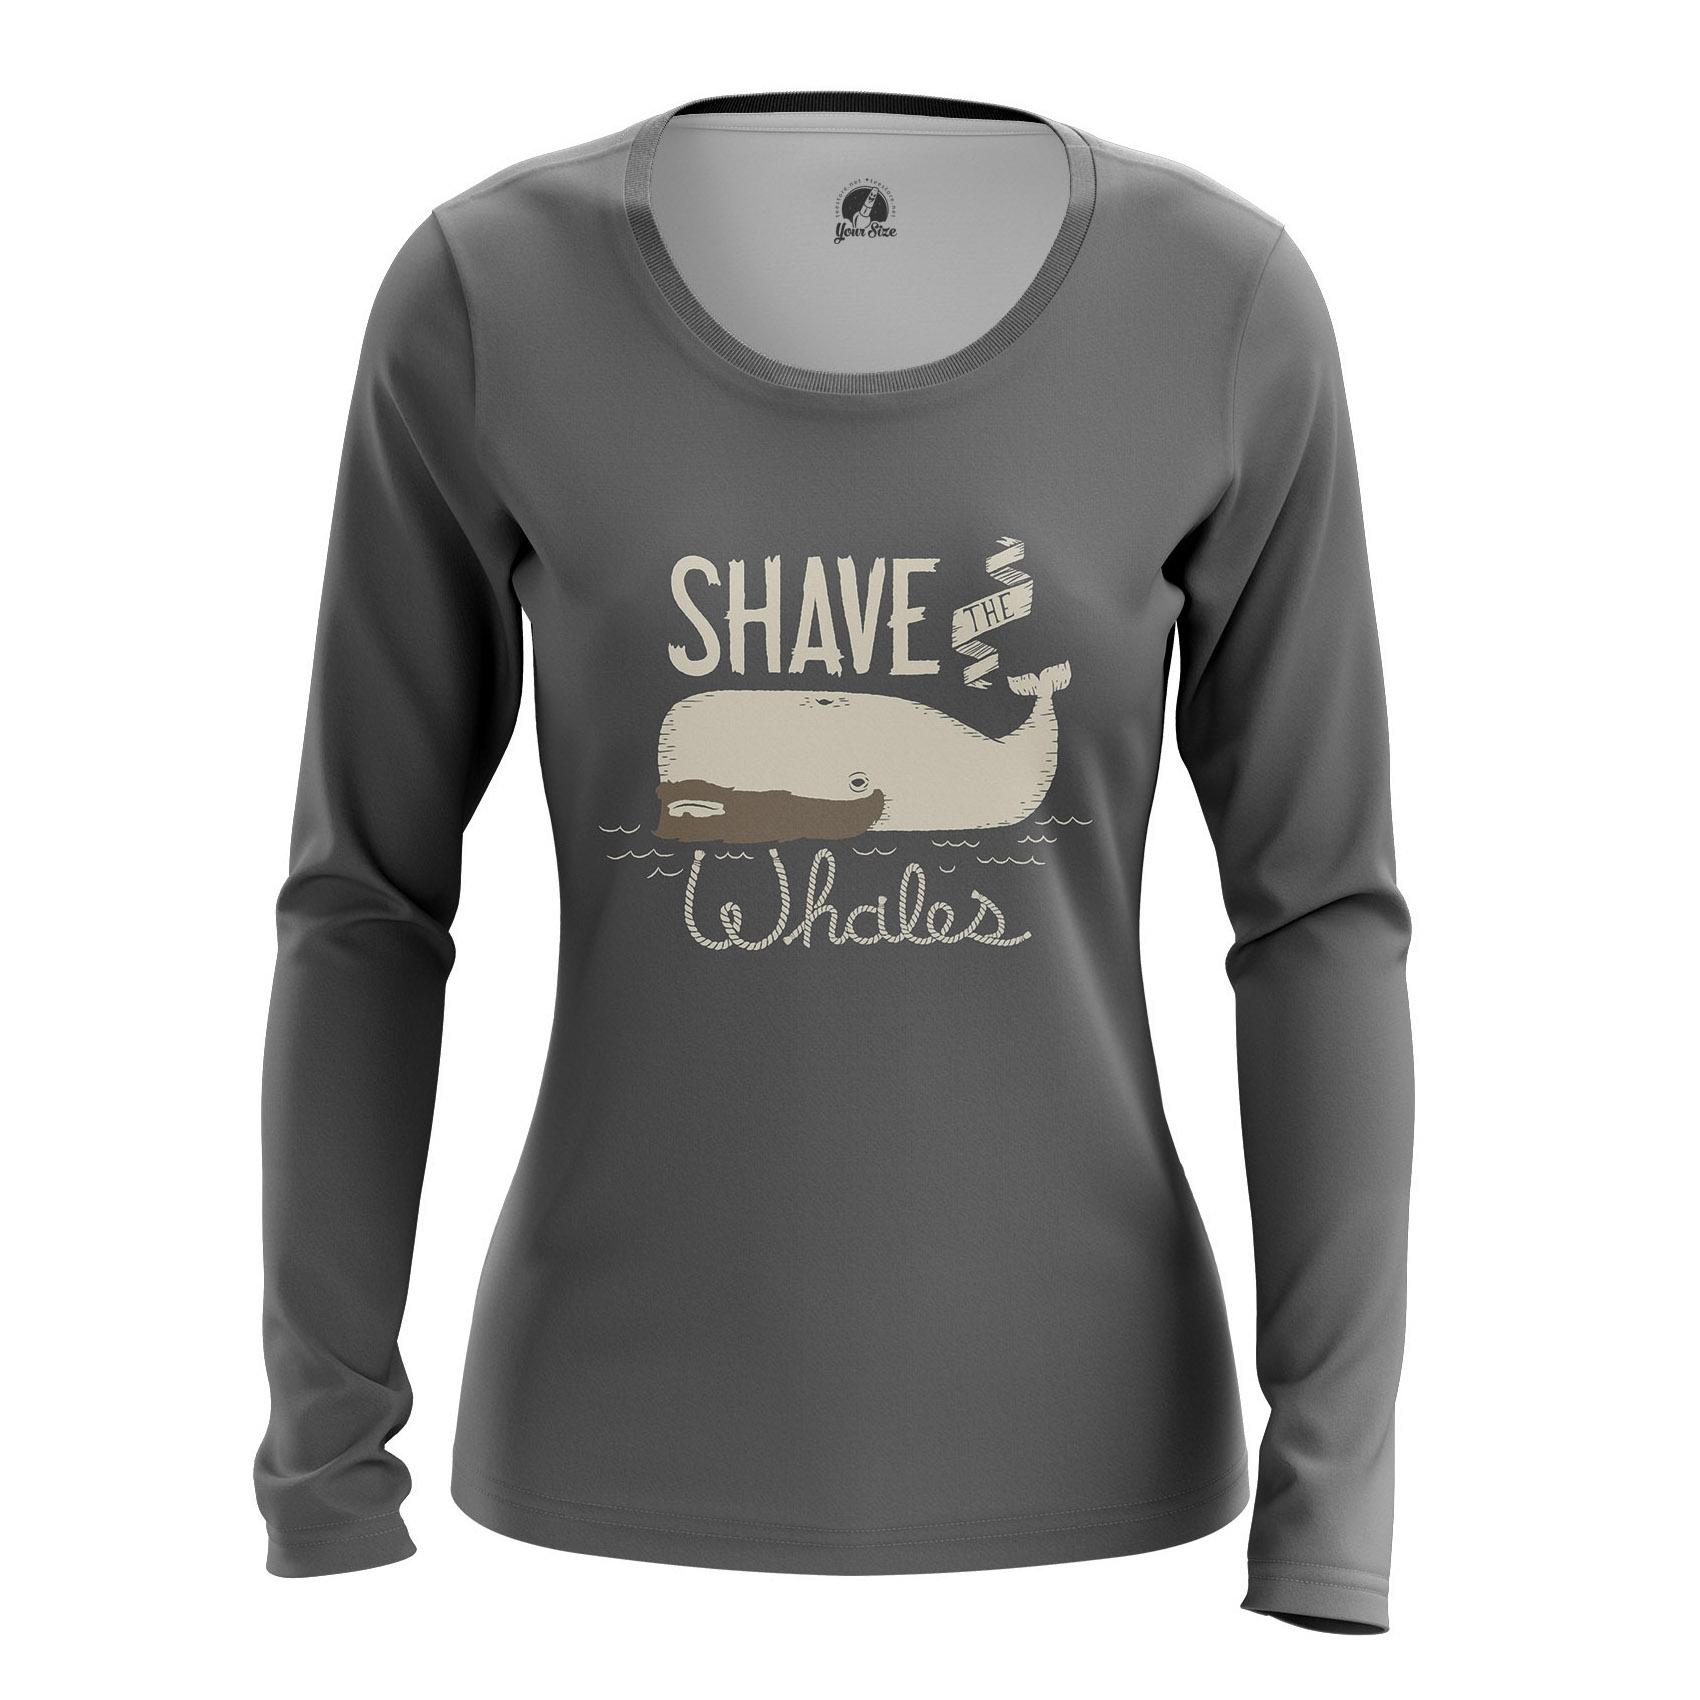 W-Lon-Shavethewhales_1482275421_538